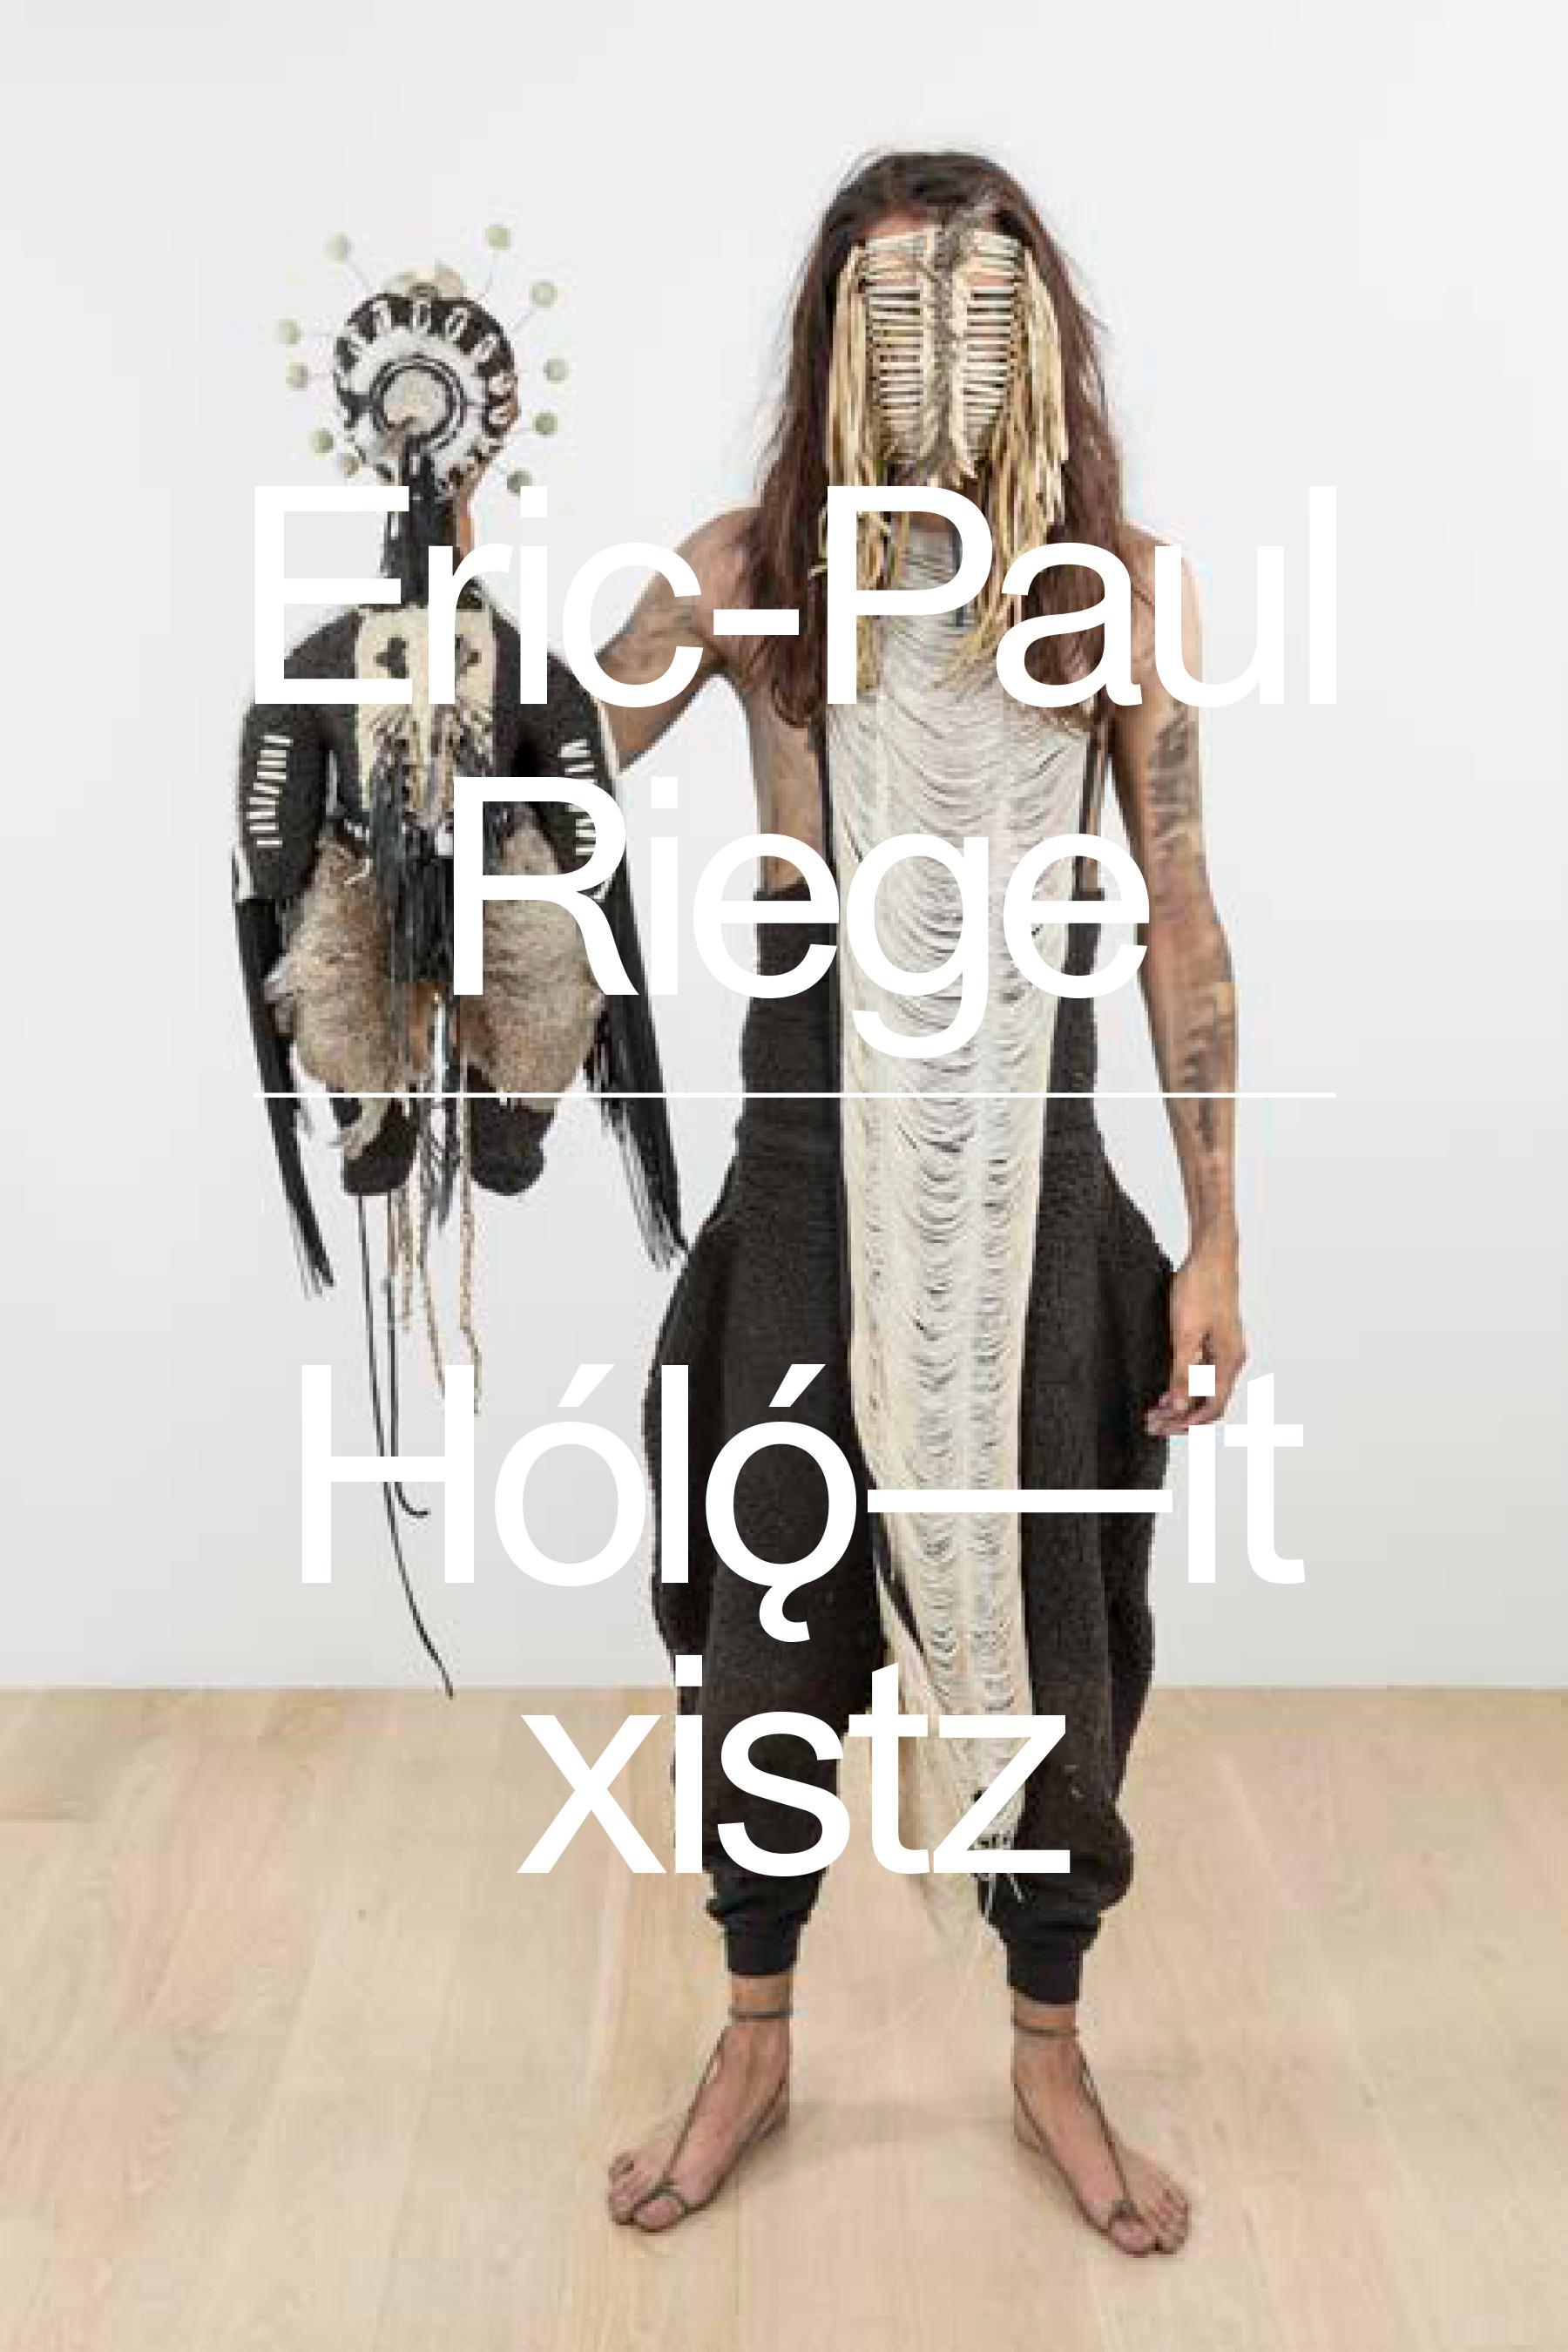 Eric-Paul Riege: Hólǫ́––it xistz, ICA Miami, Paperback Cover